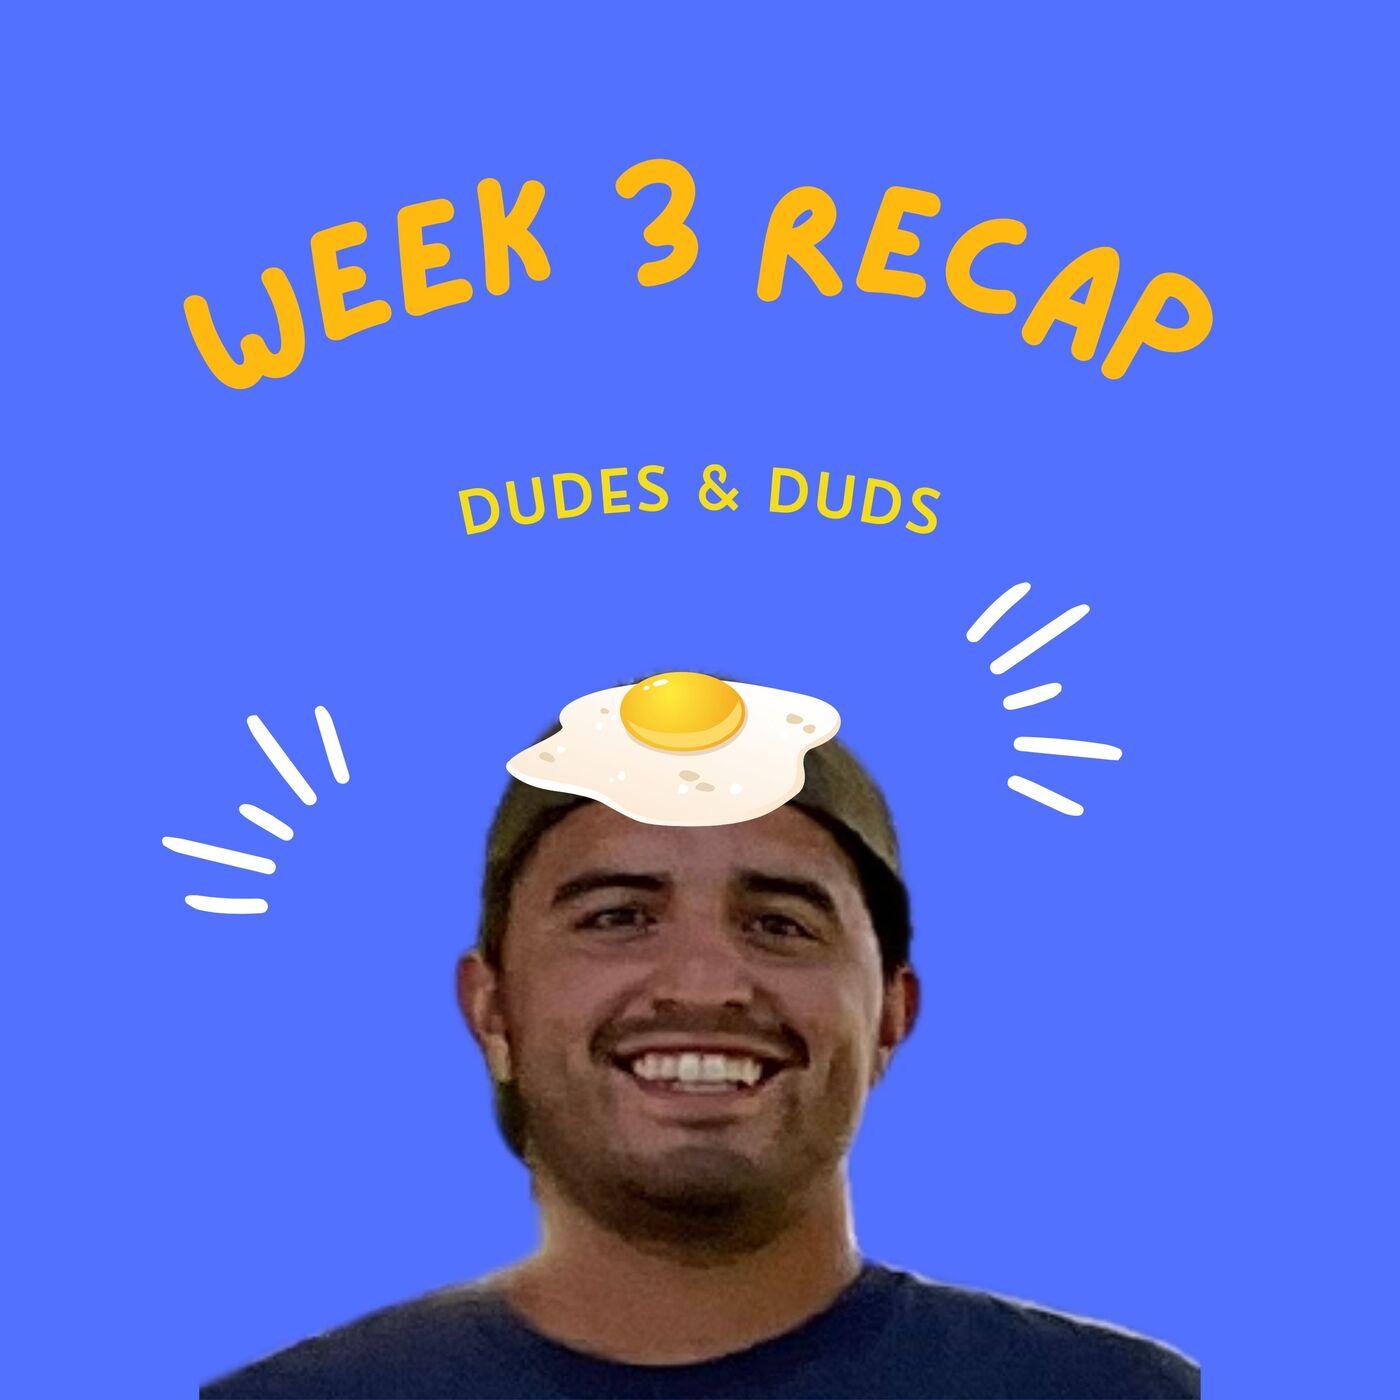 Week 3 recap + Dudes & Duds + Egg bets